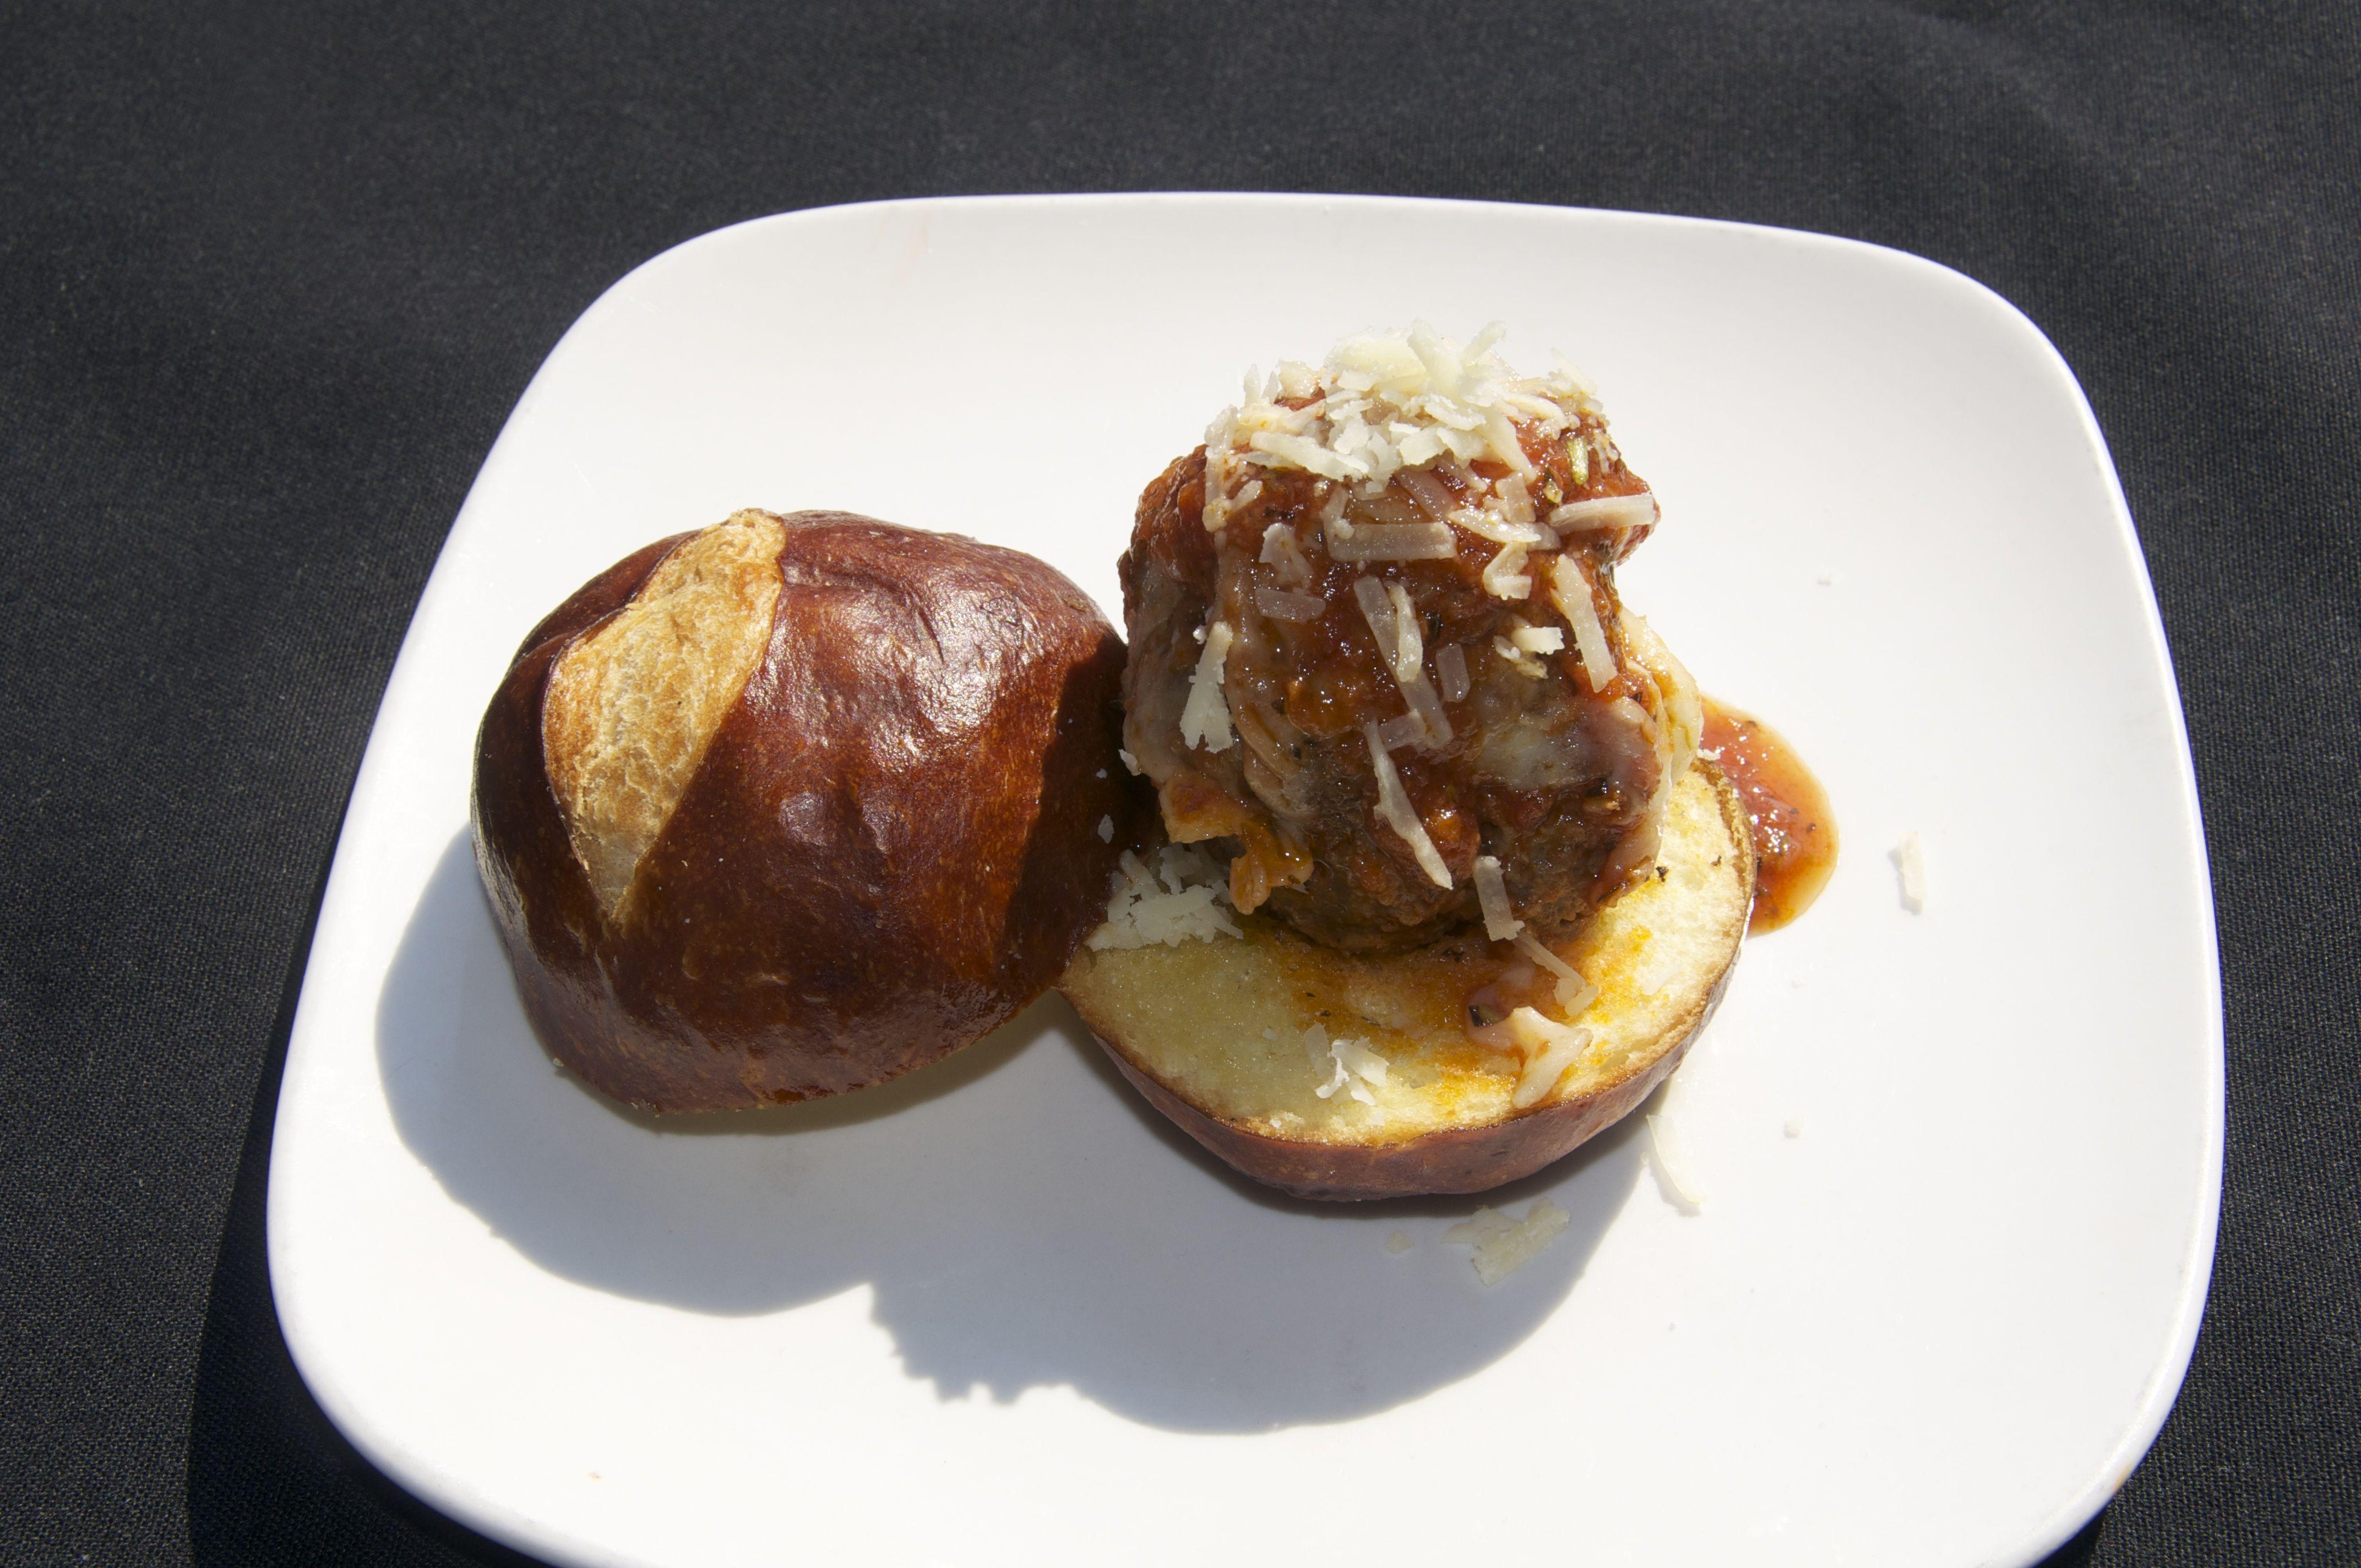 The Rock (House-made Meatball, mozzarella, and marinara on a pretzel roll)